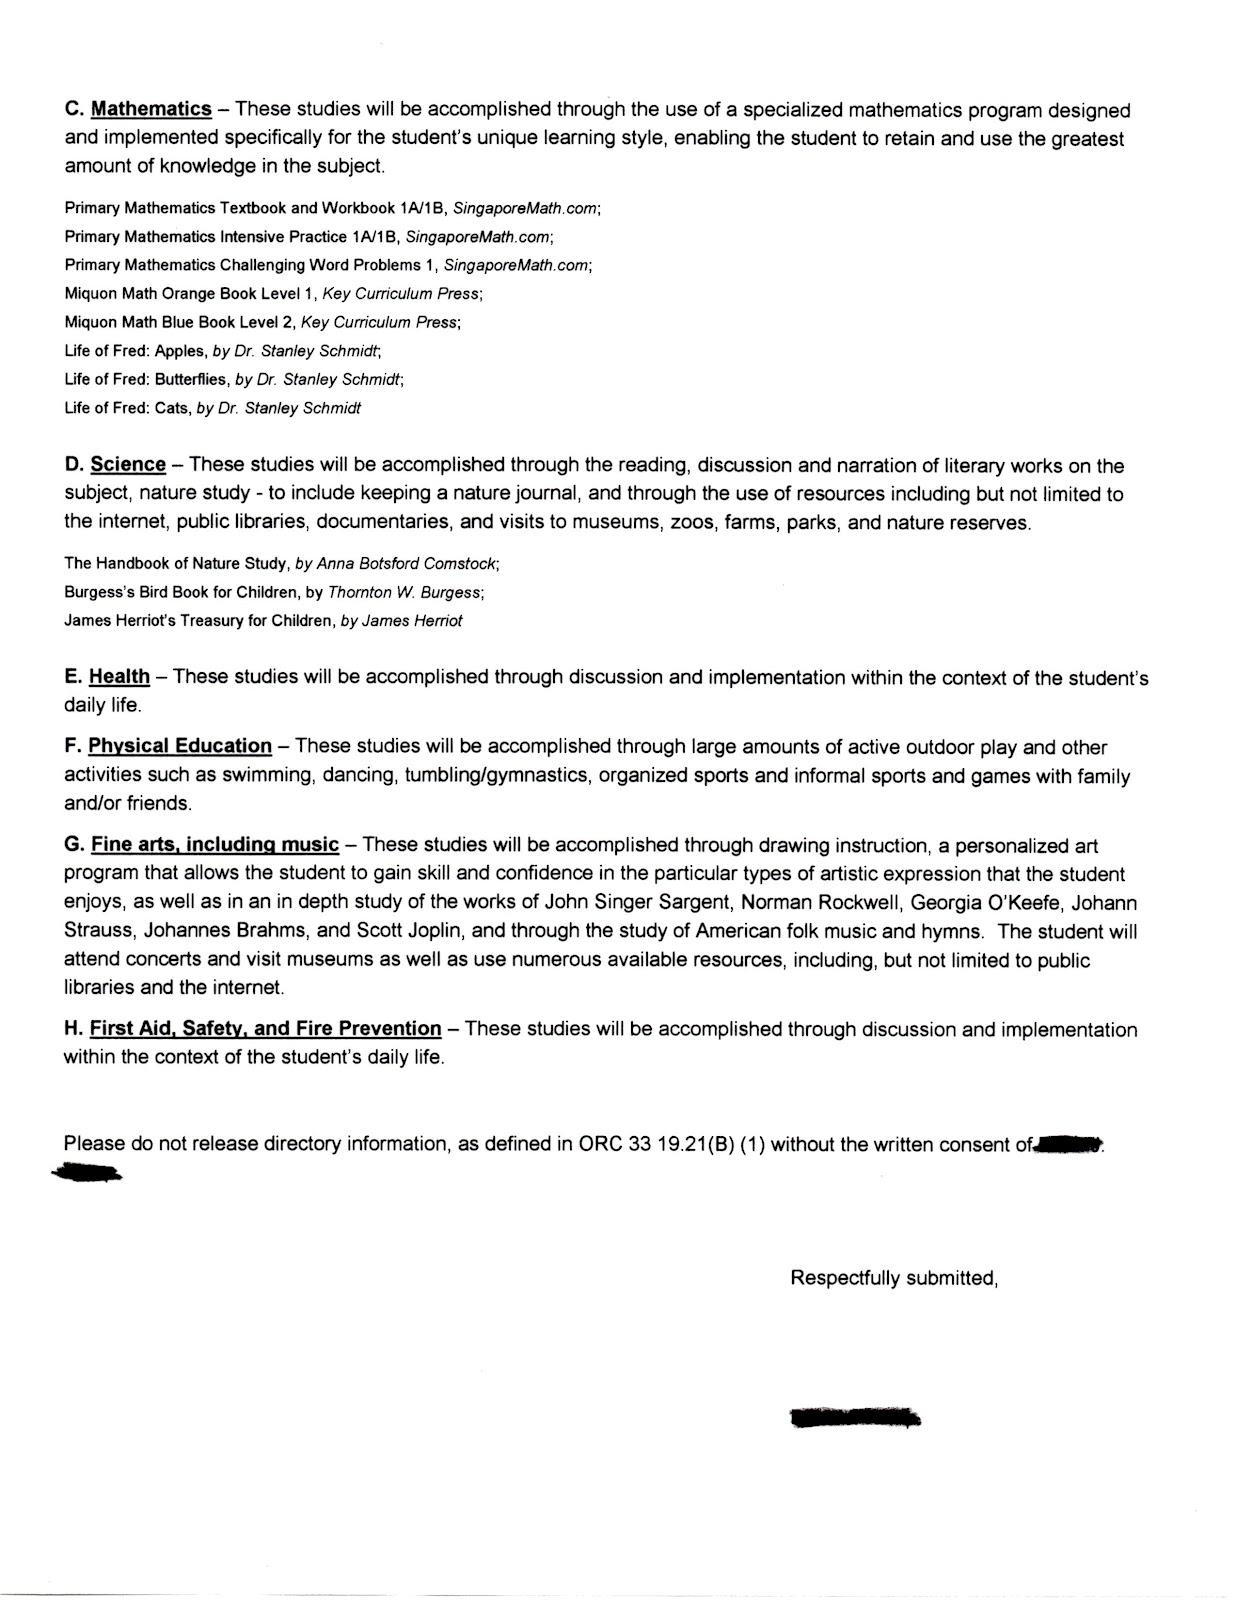 Homeschooling outline